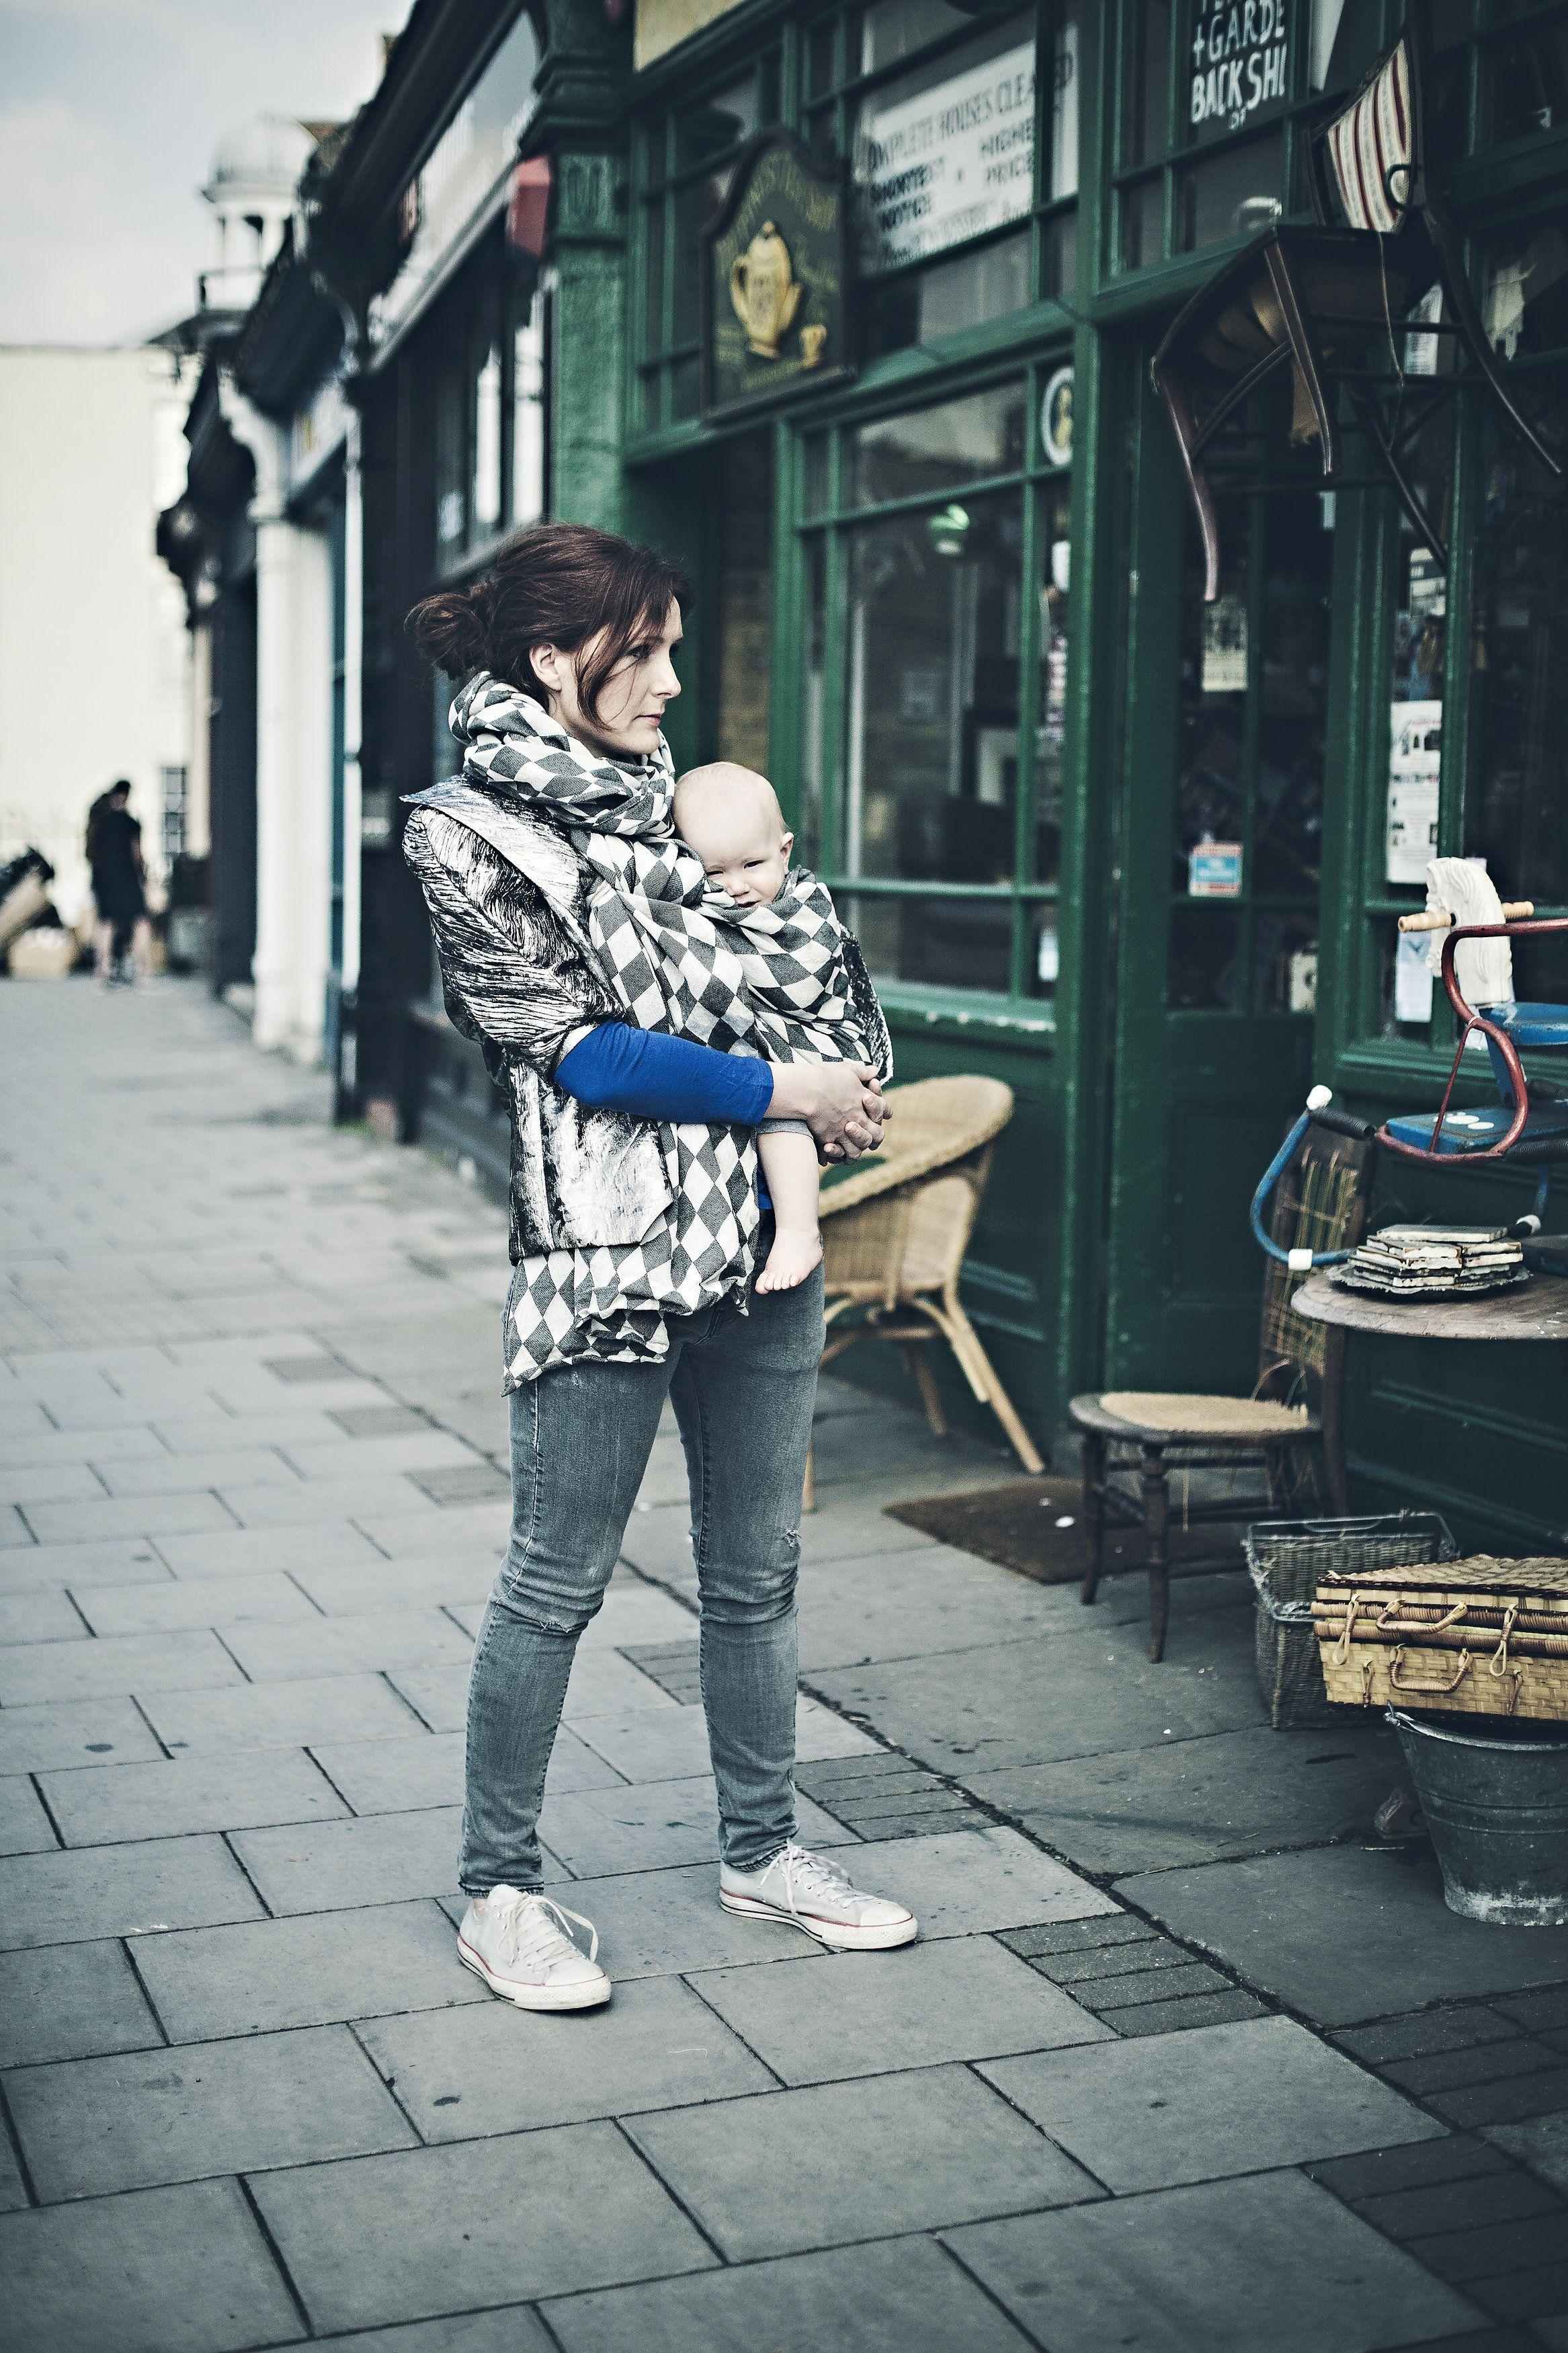 Poe Wovens, Harlequin Chic #London #Babywearing